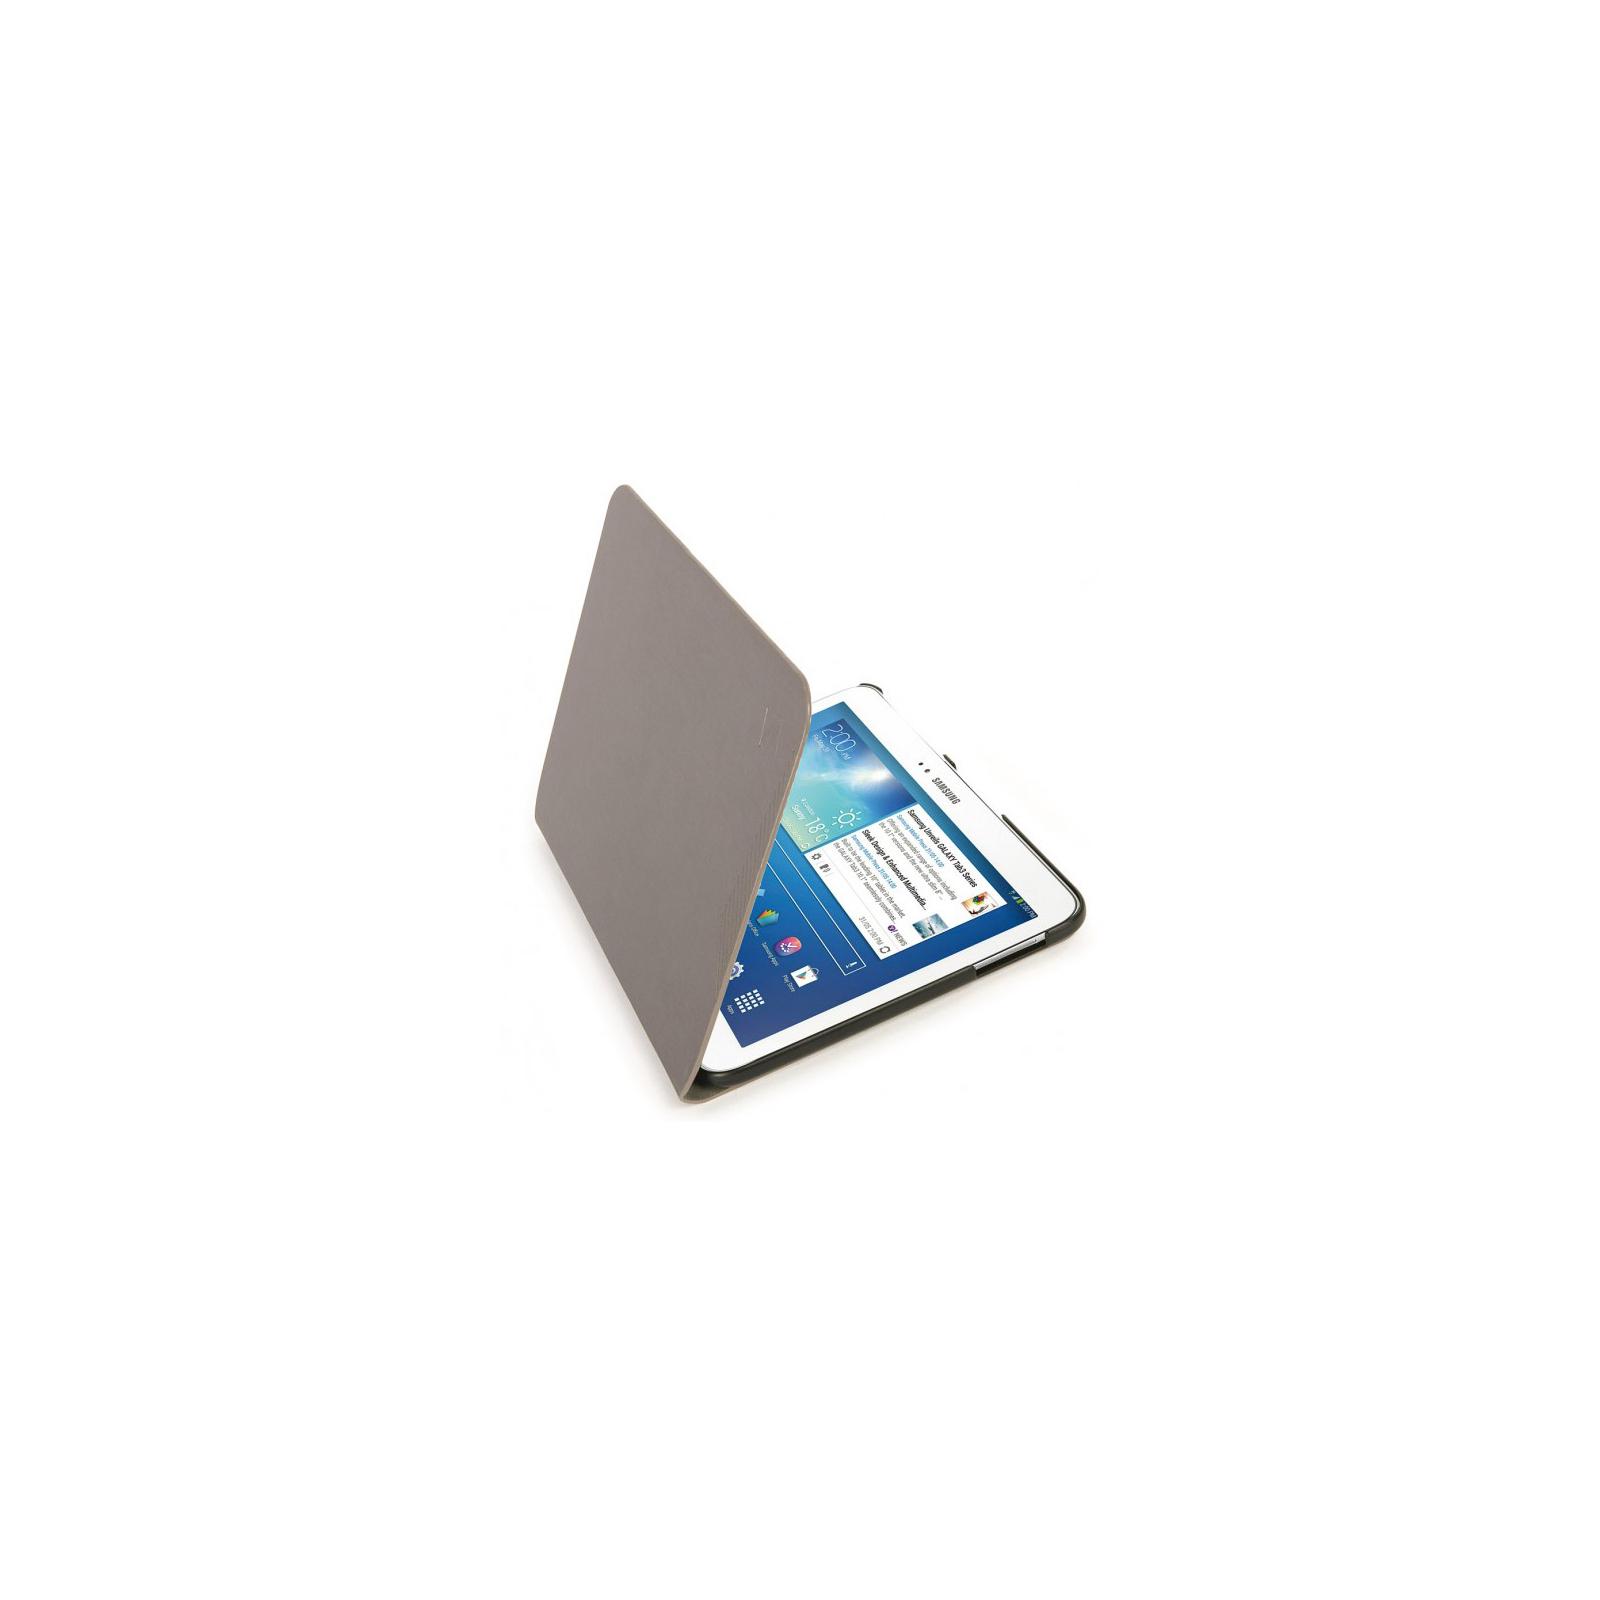 Чехол для планшета Tucano Galaxy Tab3 10.1 Macro (TAB-MS310-G) изображение 4